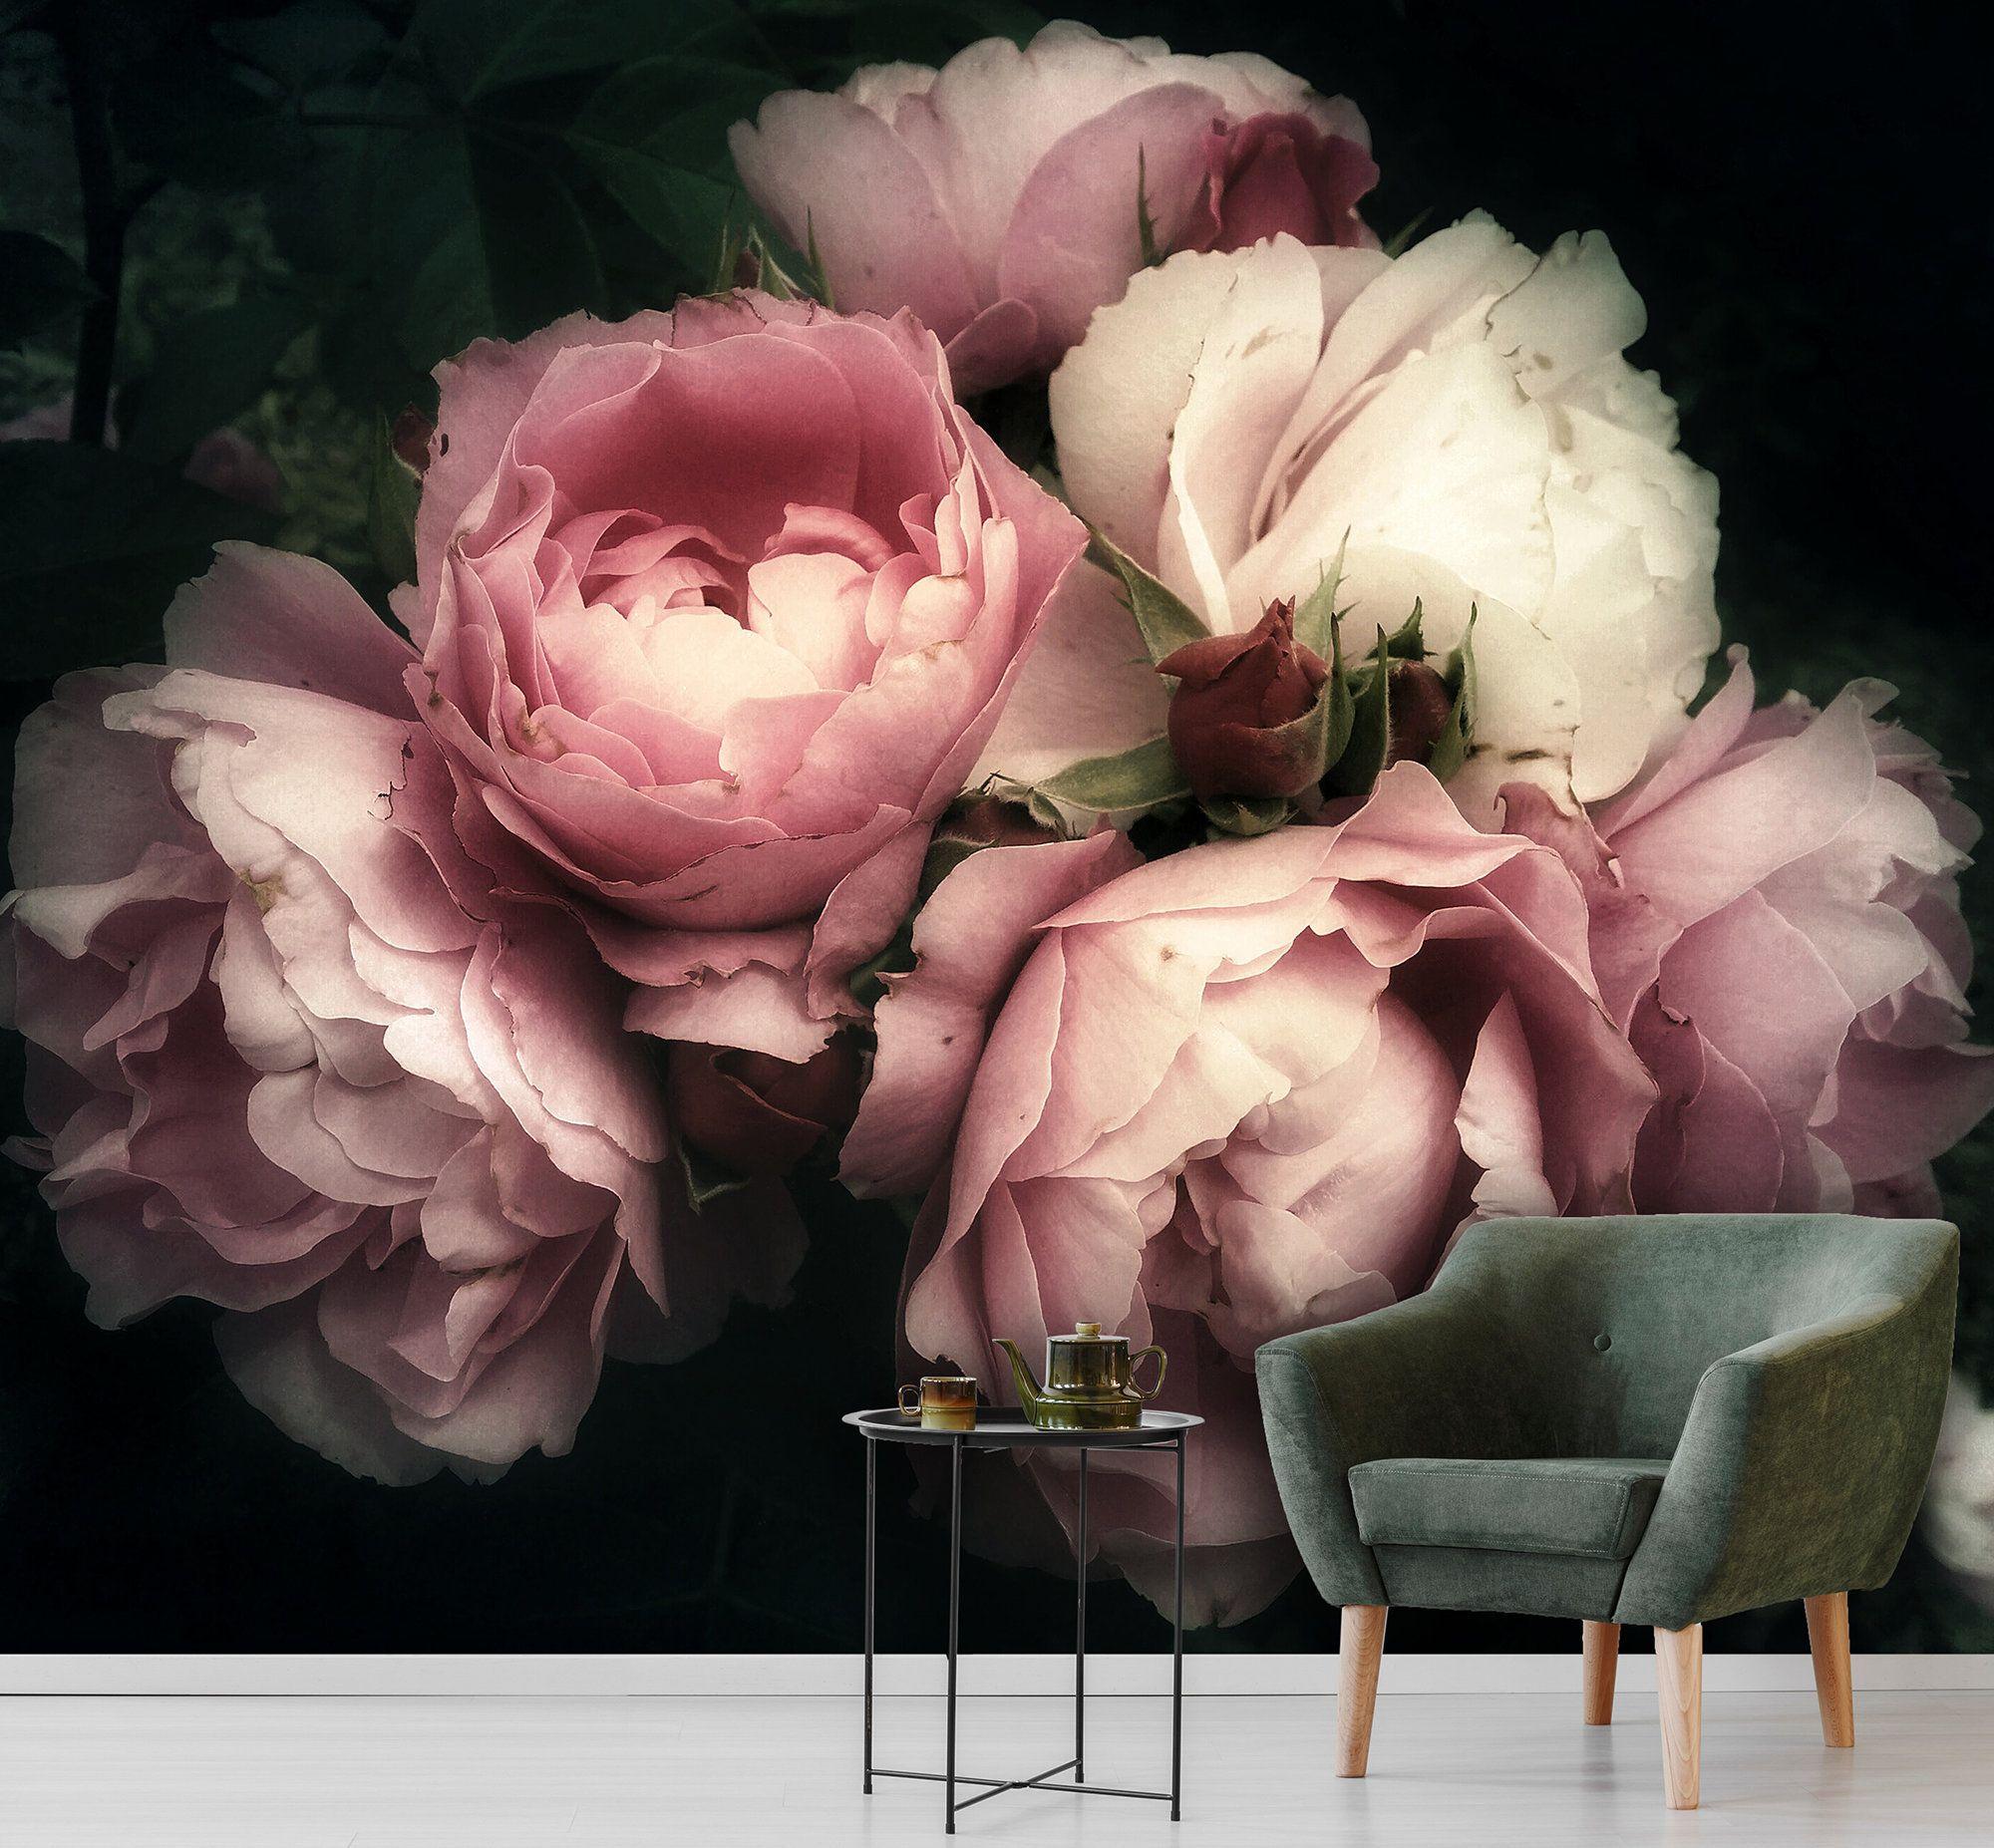 Pink rose removable wallpaper, dark floral mural, blush